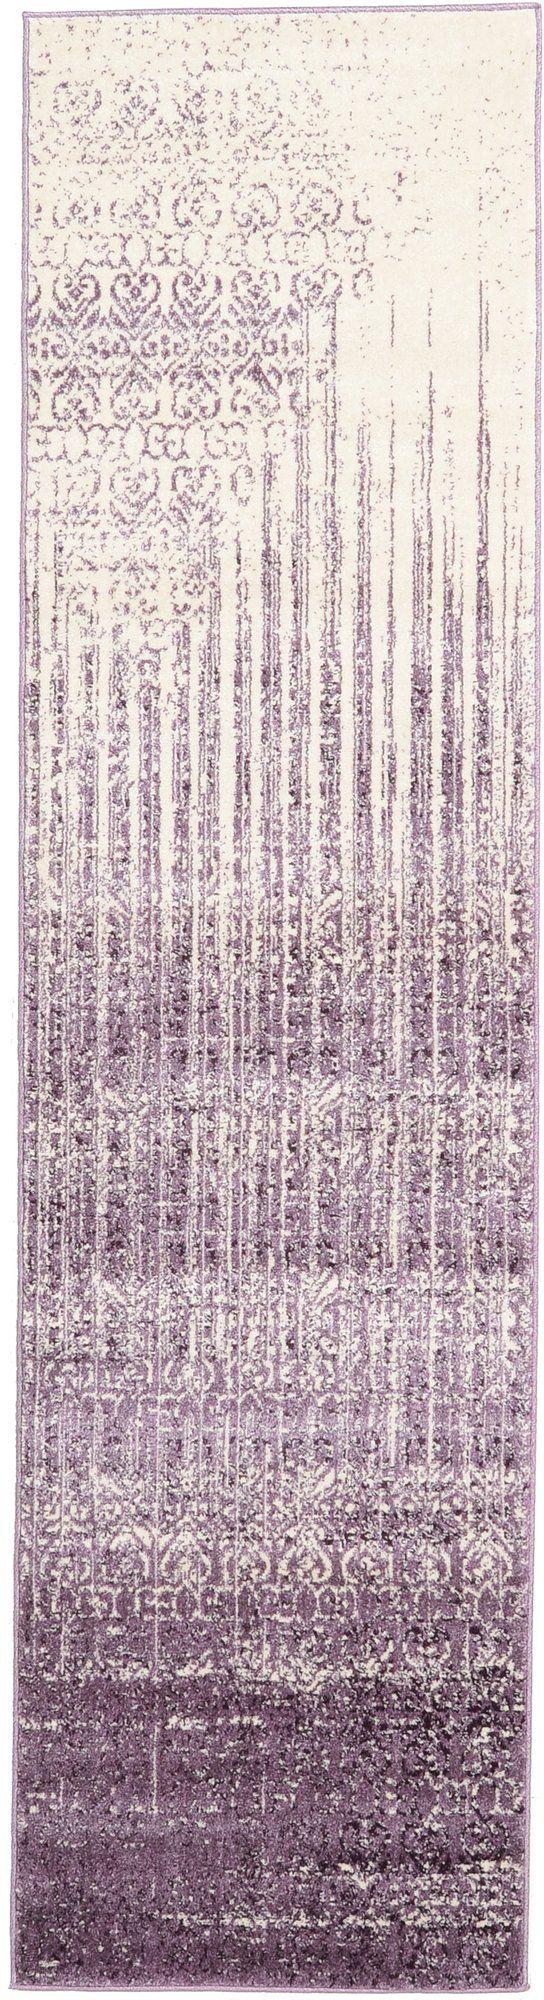 "Demetria 2'7"" x 10' Rug in Purple"